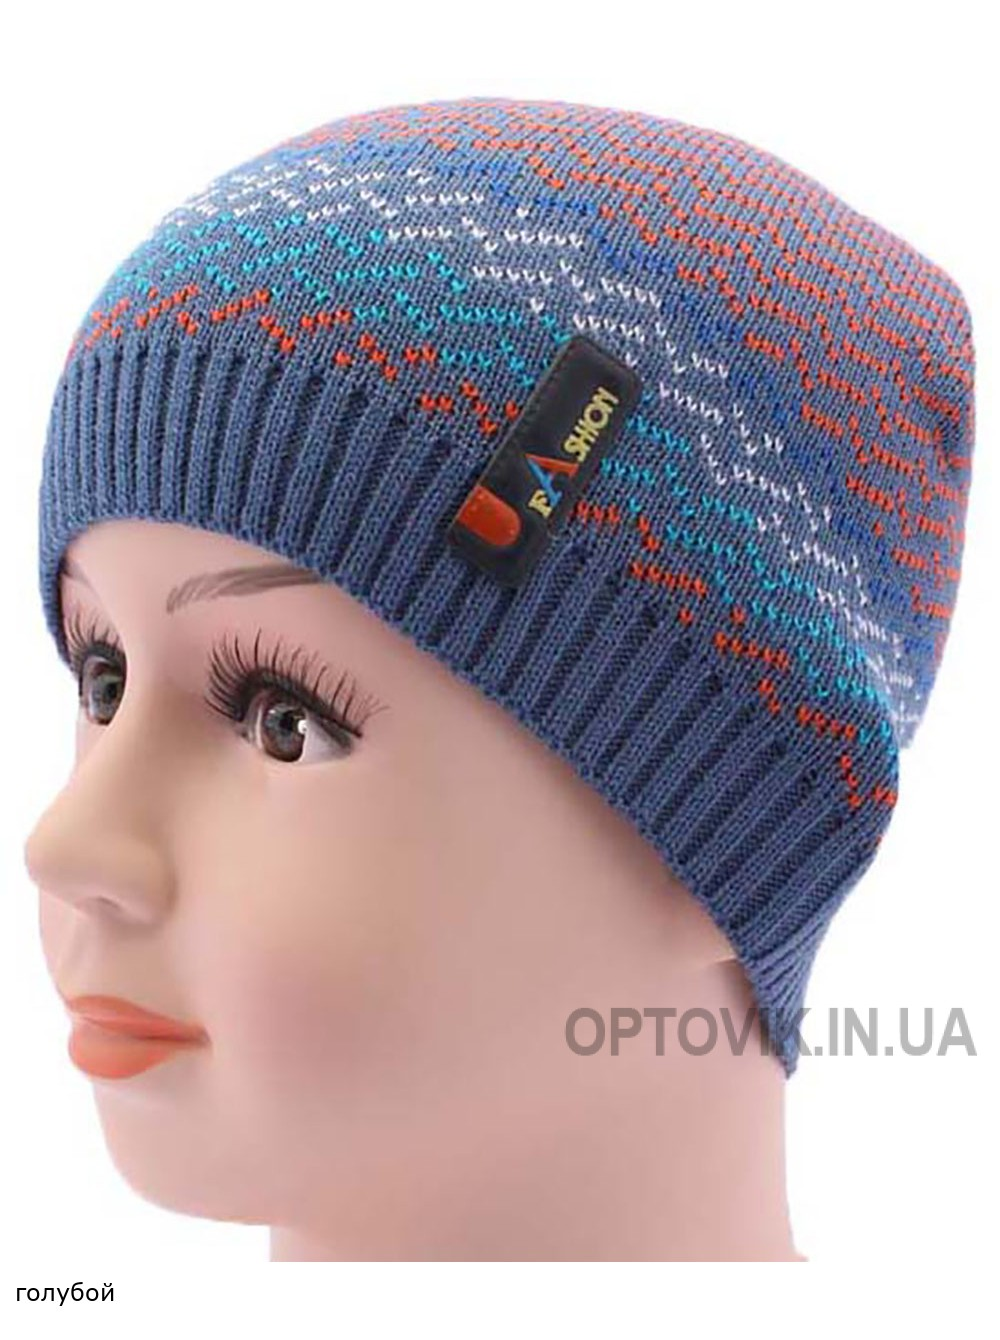 Детская вязаная шапка BVA01509-46-50